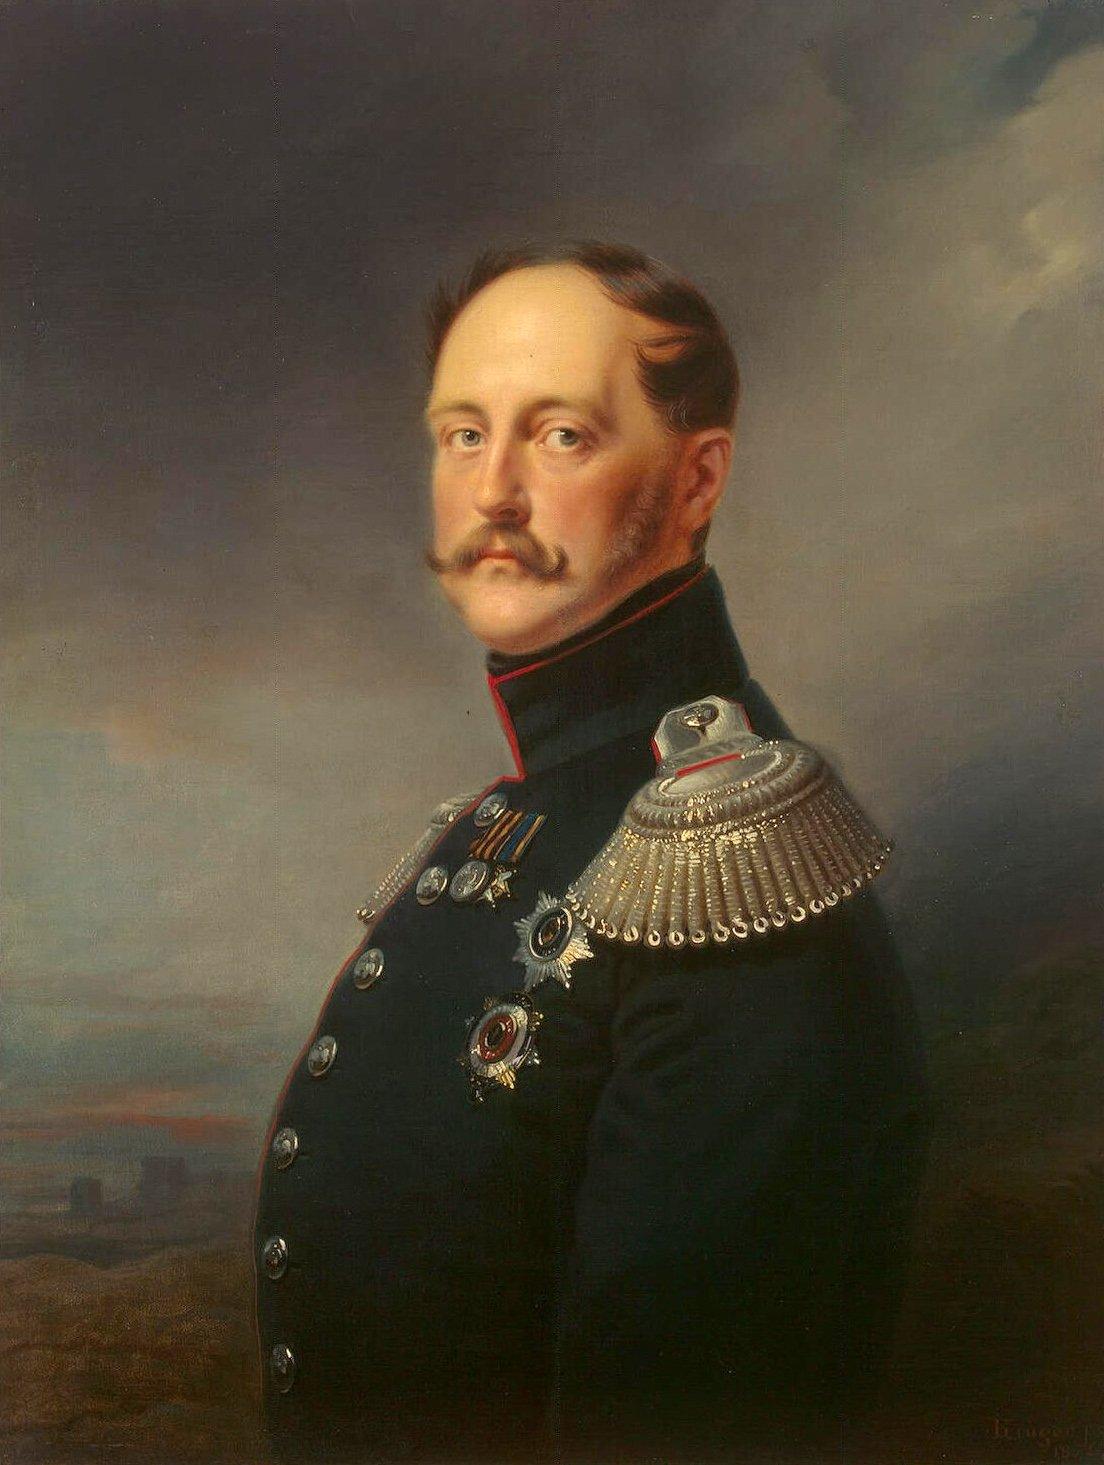 Franz_Krüger__Portrait_of_Emperor_Nicholas_I__WGA12289.jpg